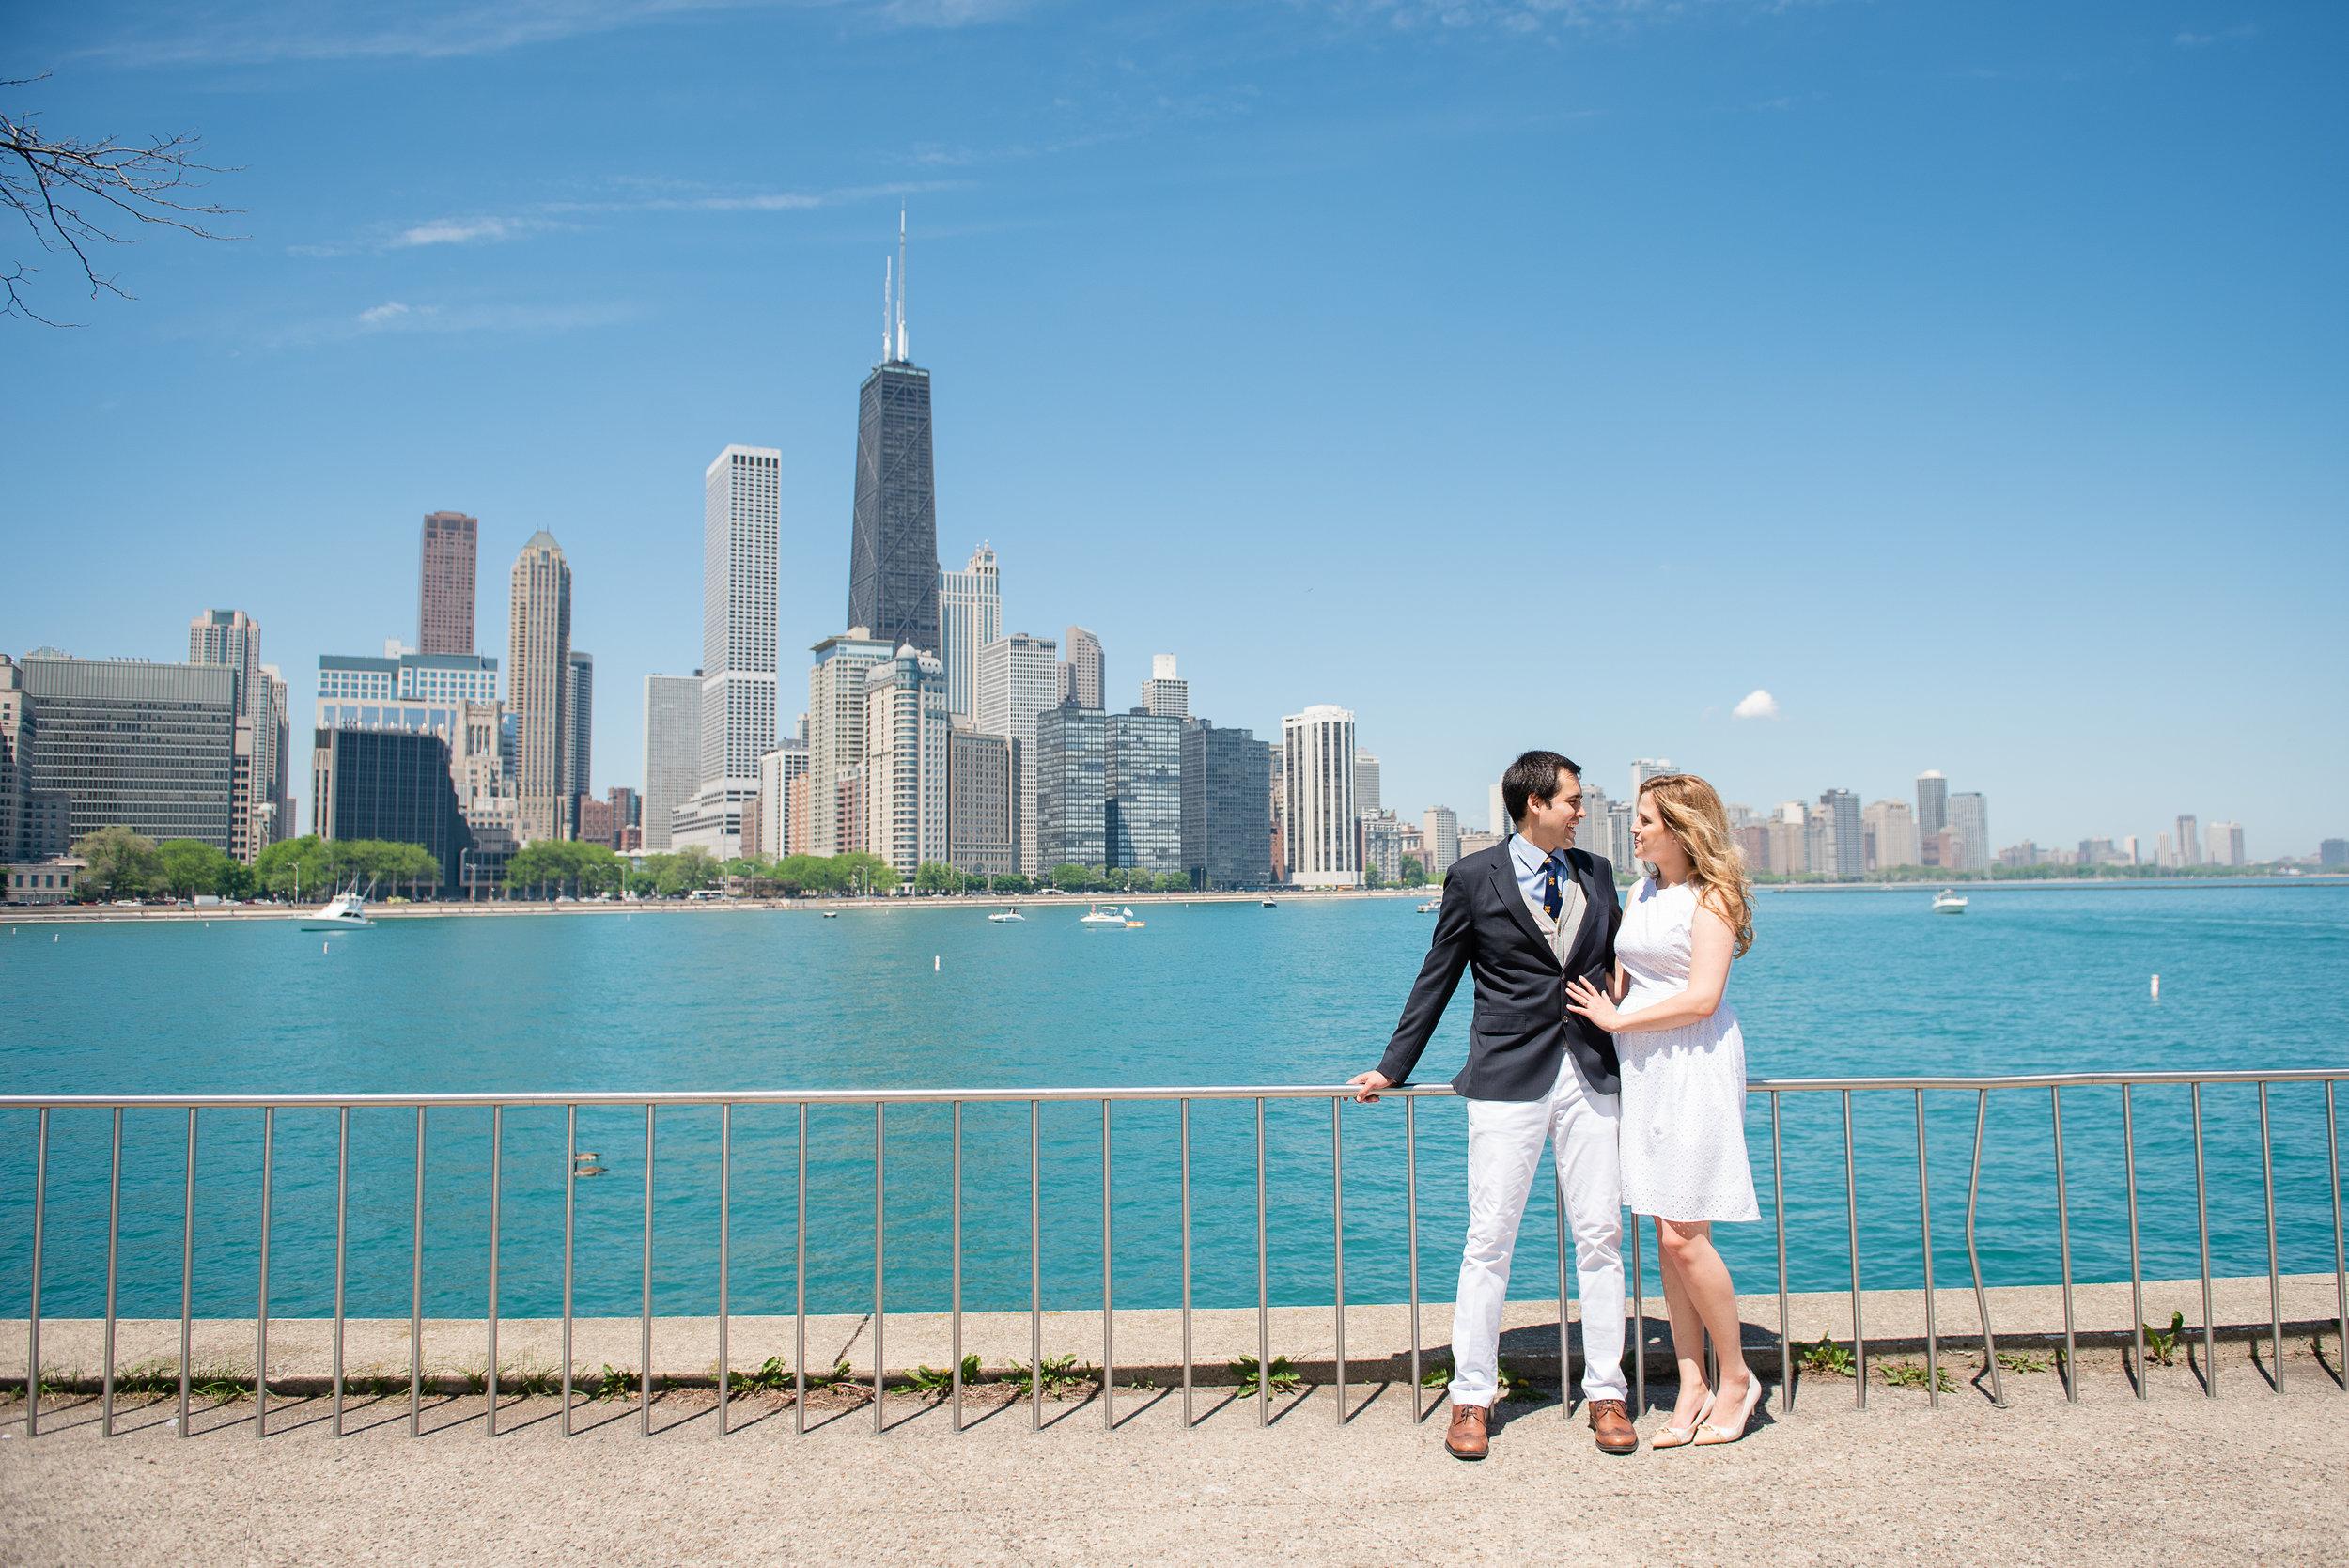 Chicago-downtown-summer-engagement-session-Kimberly-Hernan-MettsPhoto-1.jpg